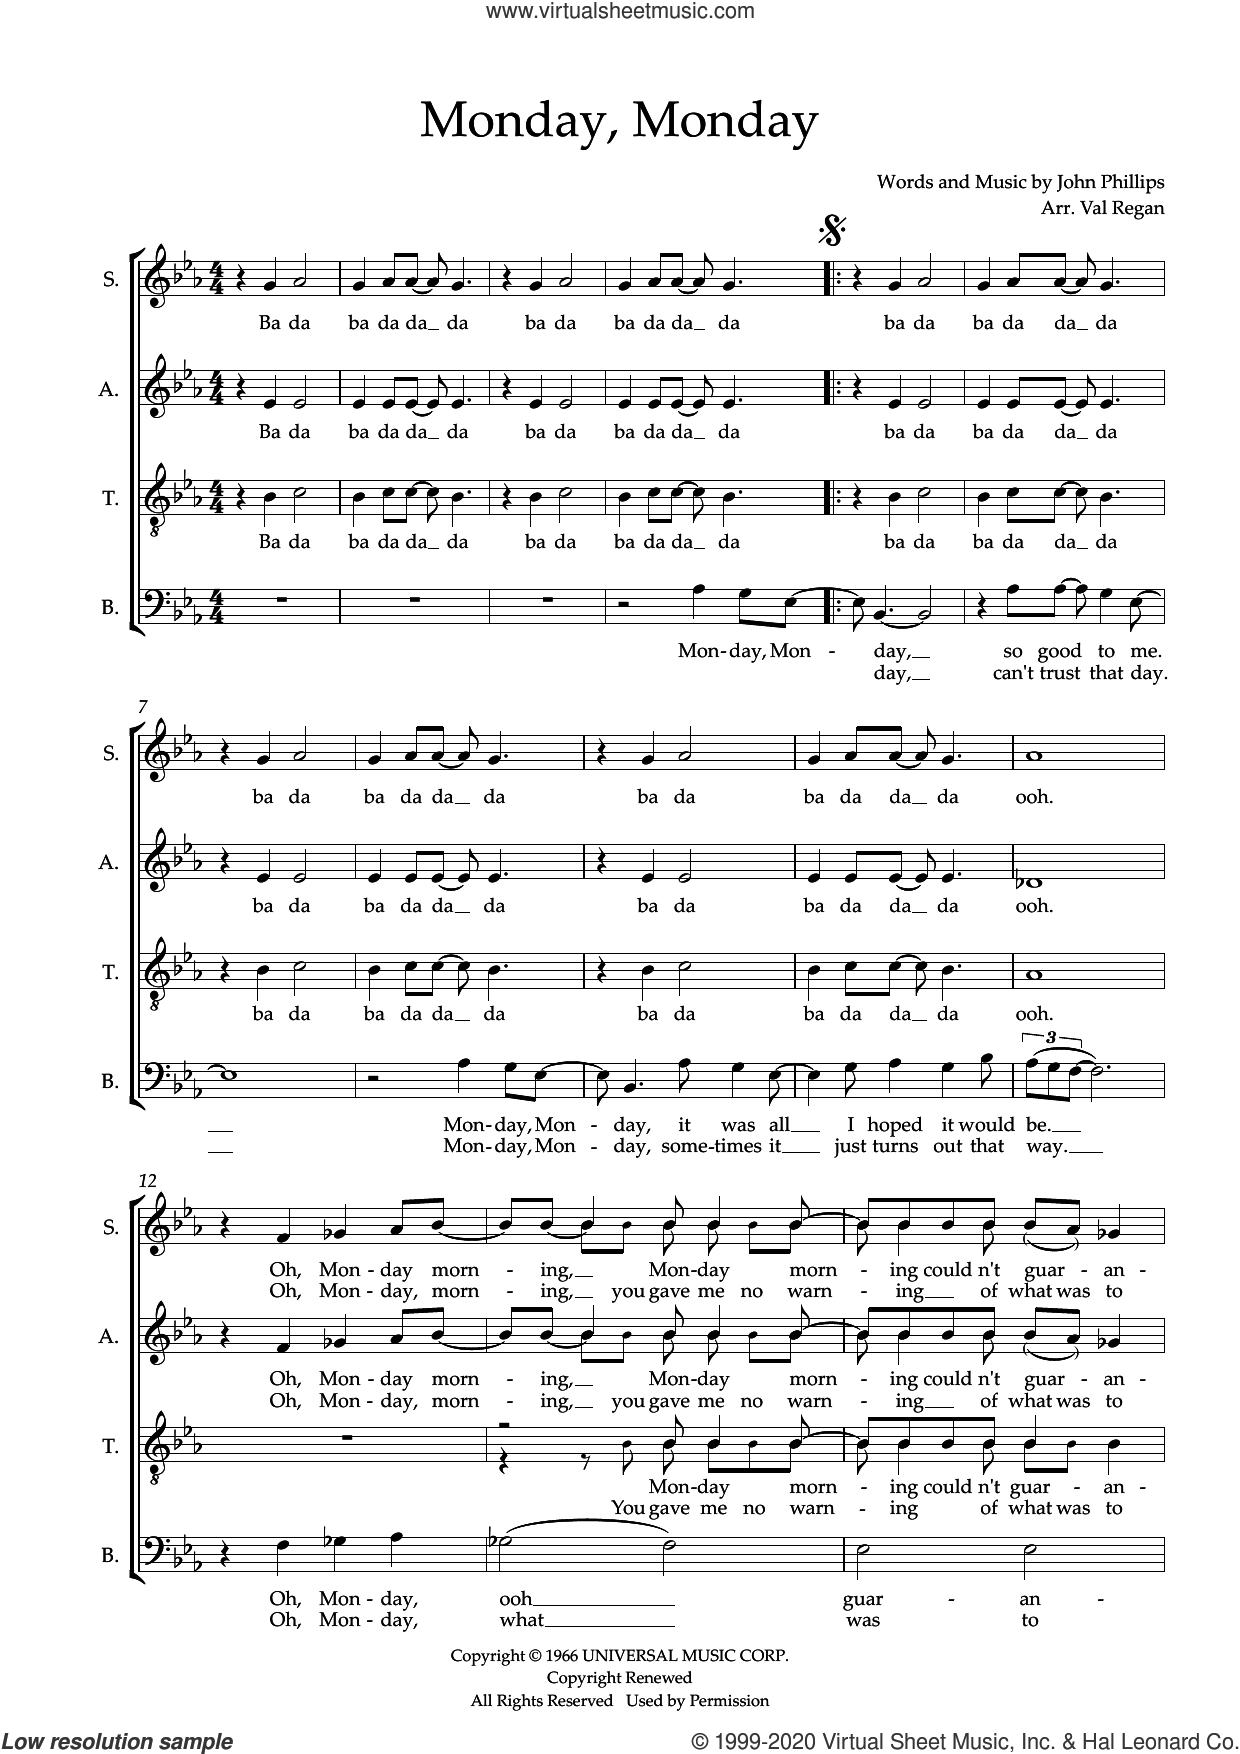 Monday, Monday (arr. Val Regan) sheet music for choir (SATB: soprano, alto, tenor, bass) by The Mamas and the Papas, Val Regan and John Phillips, intermediate skill level